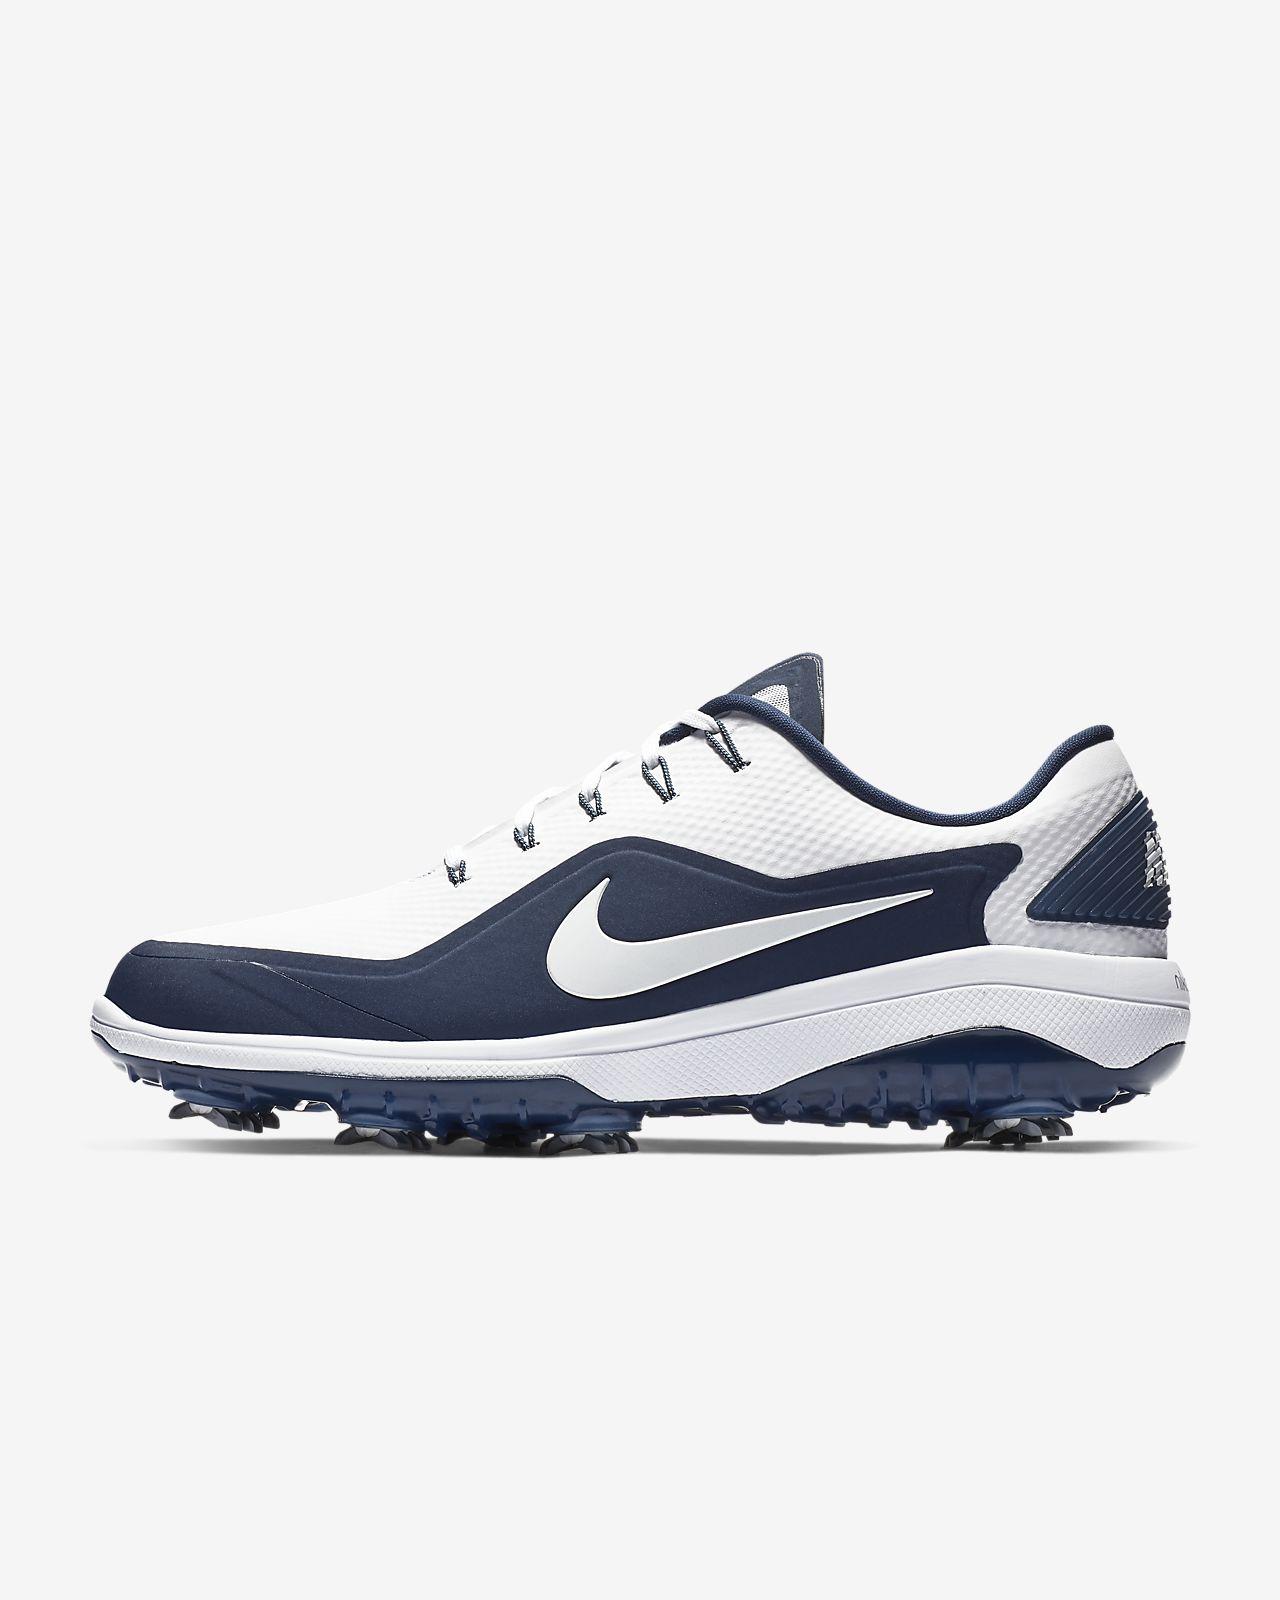 Męskie buty do golfa Nike React Vapor 2